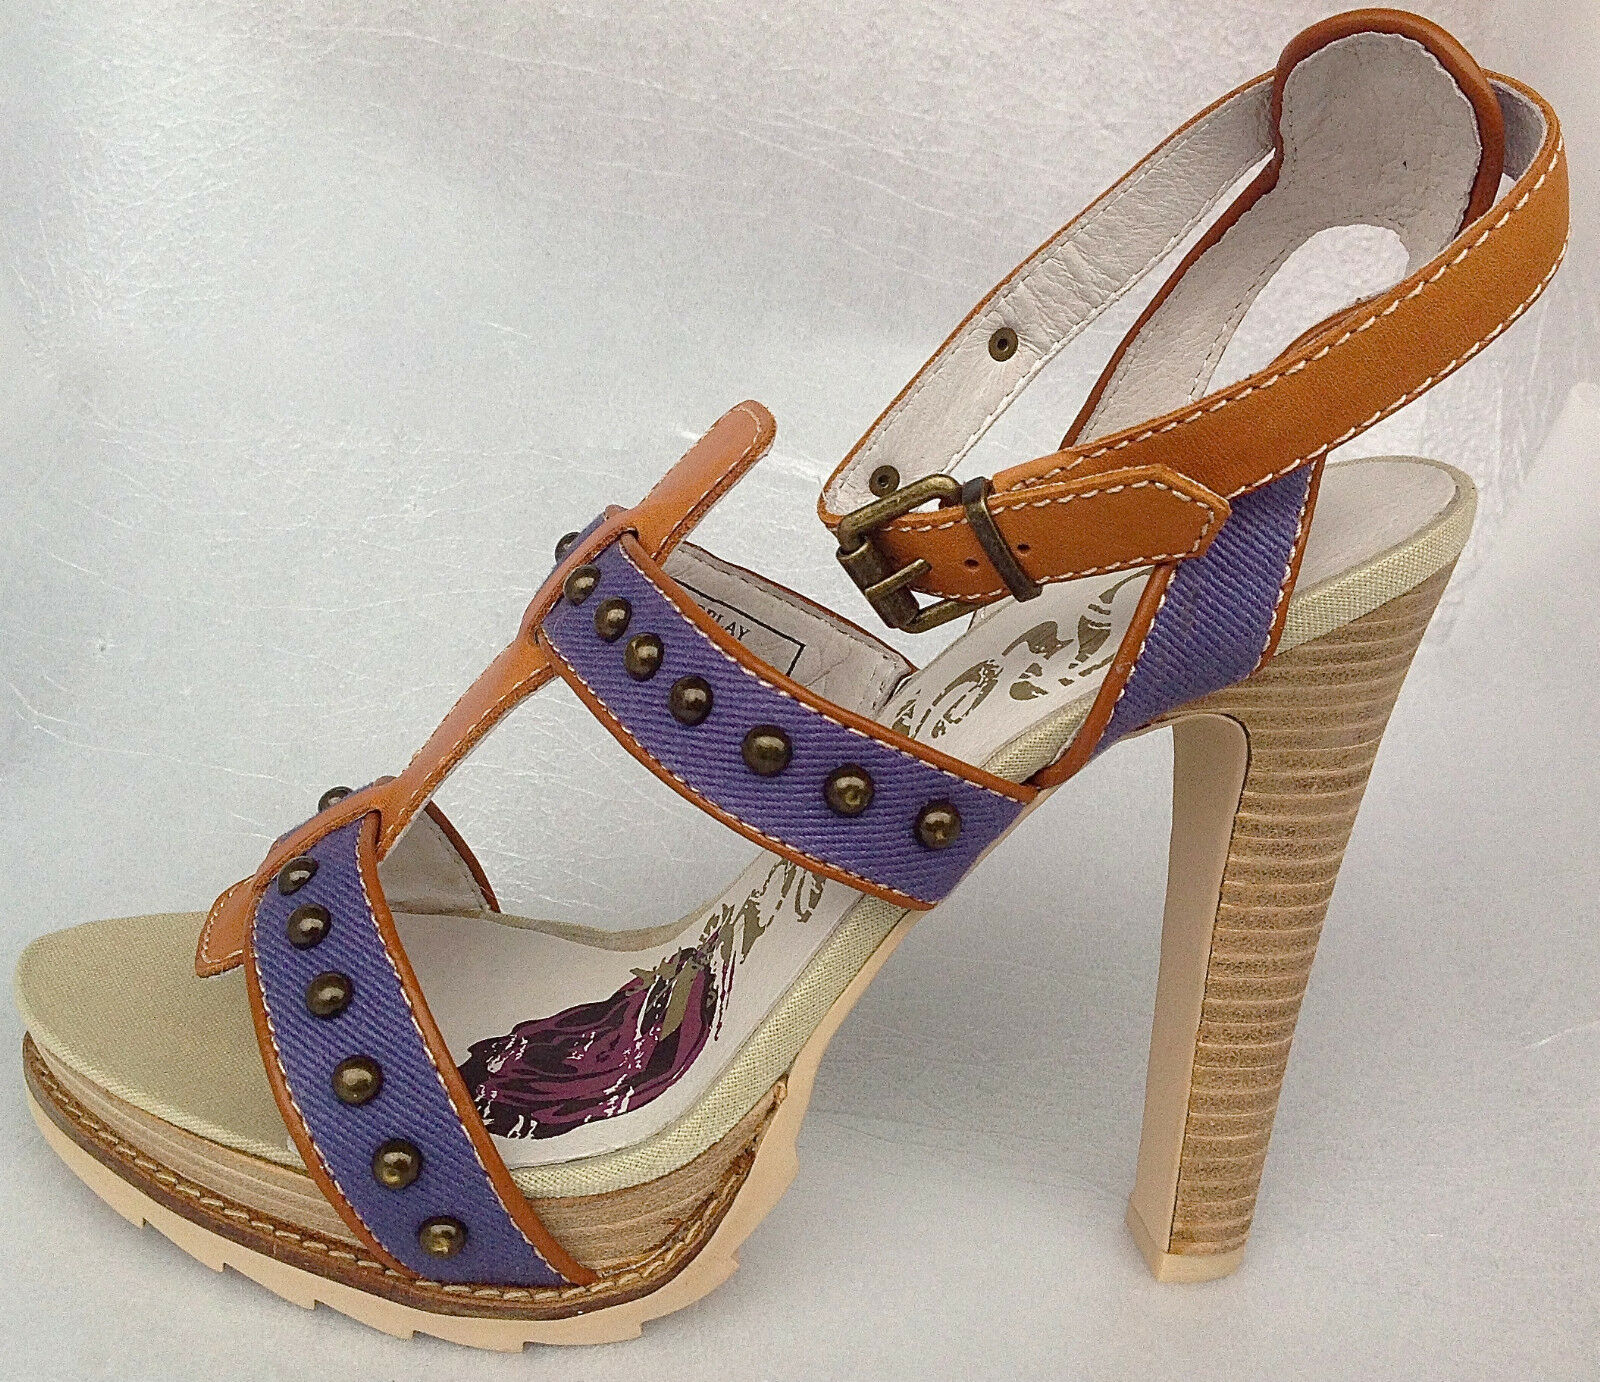 REPLAY ADELINE rp420002t Mujer Sandalias sandals UE 39 , 40 , GB 4-7